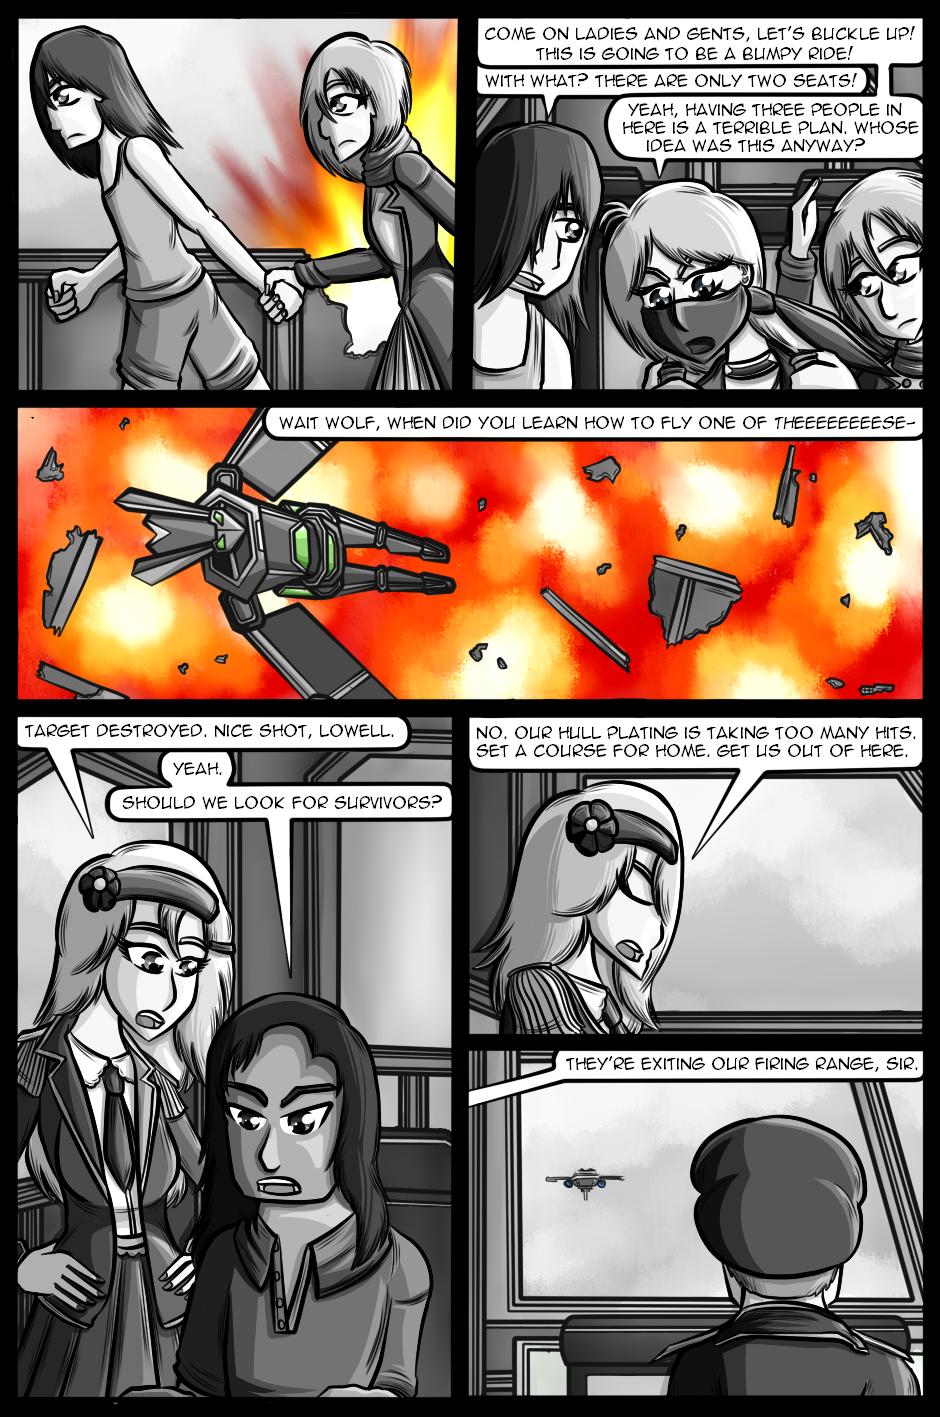 Fire Suppression, Part 37